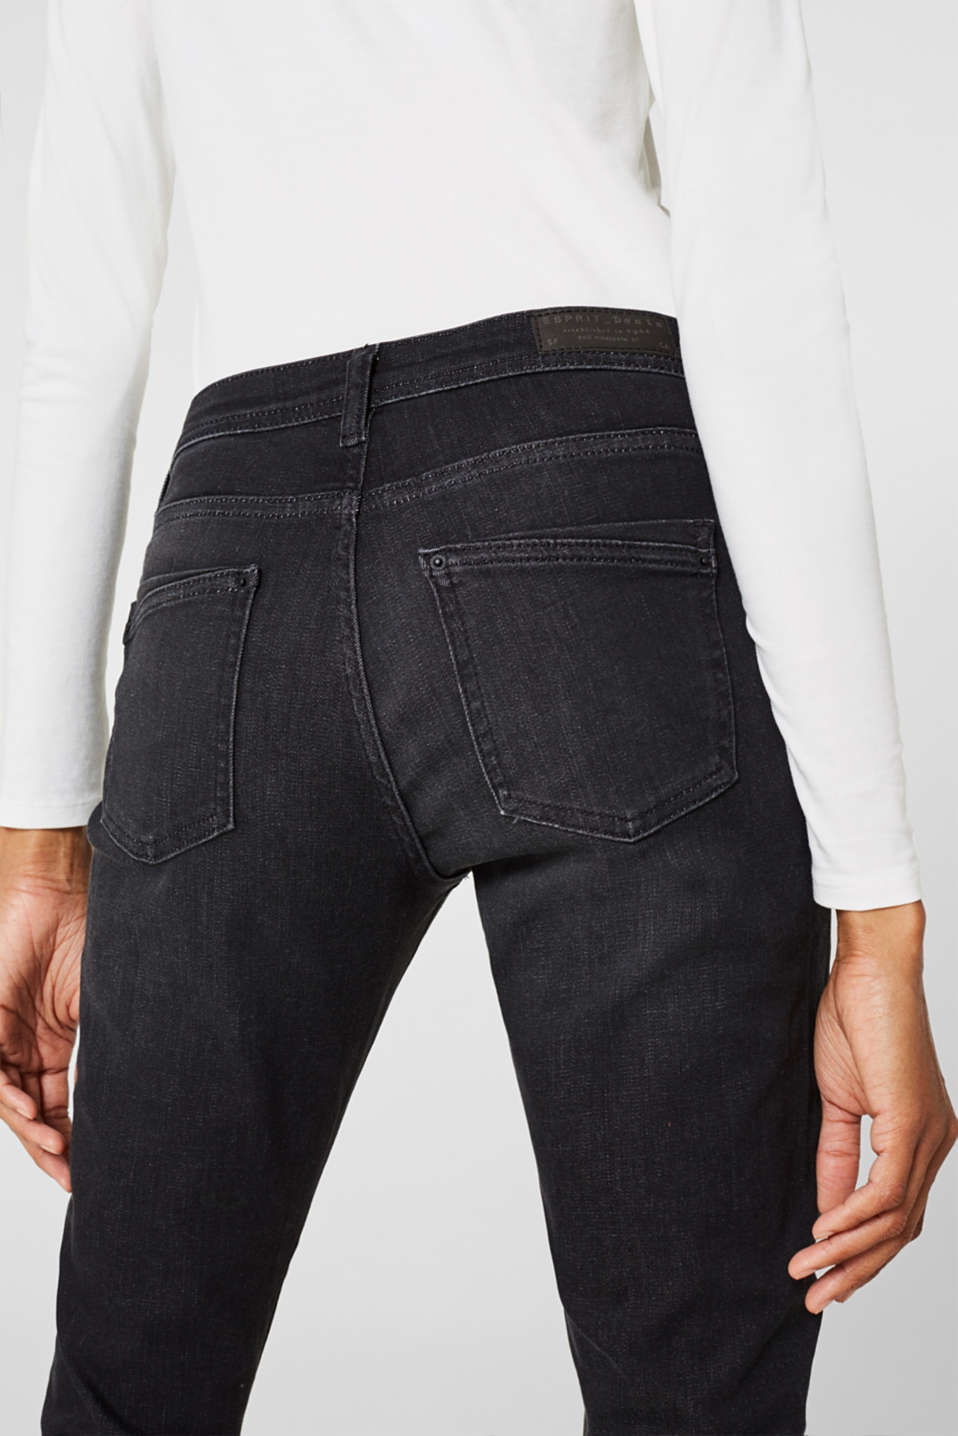 Pants denim, BLACK DARK WASH, detail image number 4